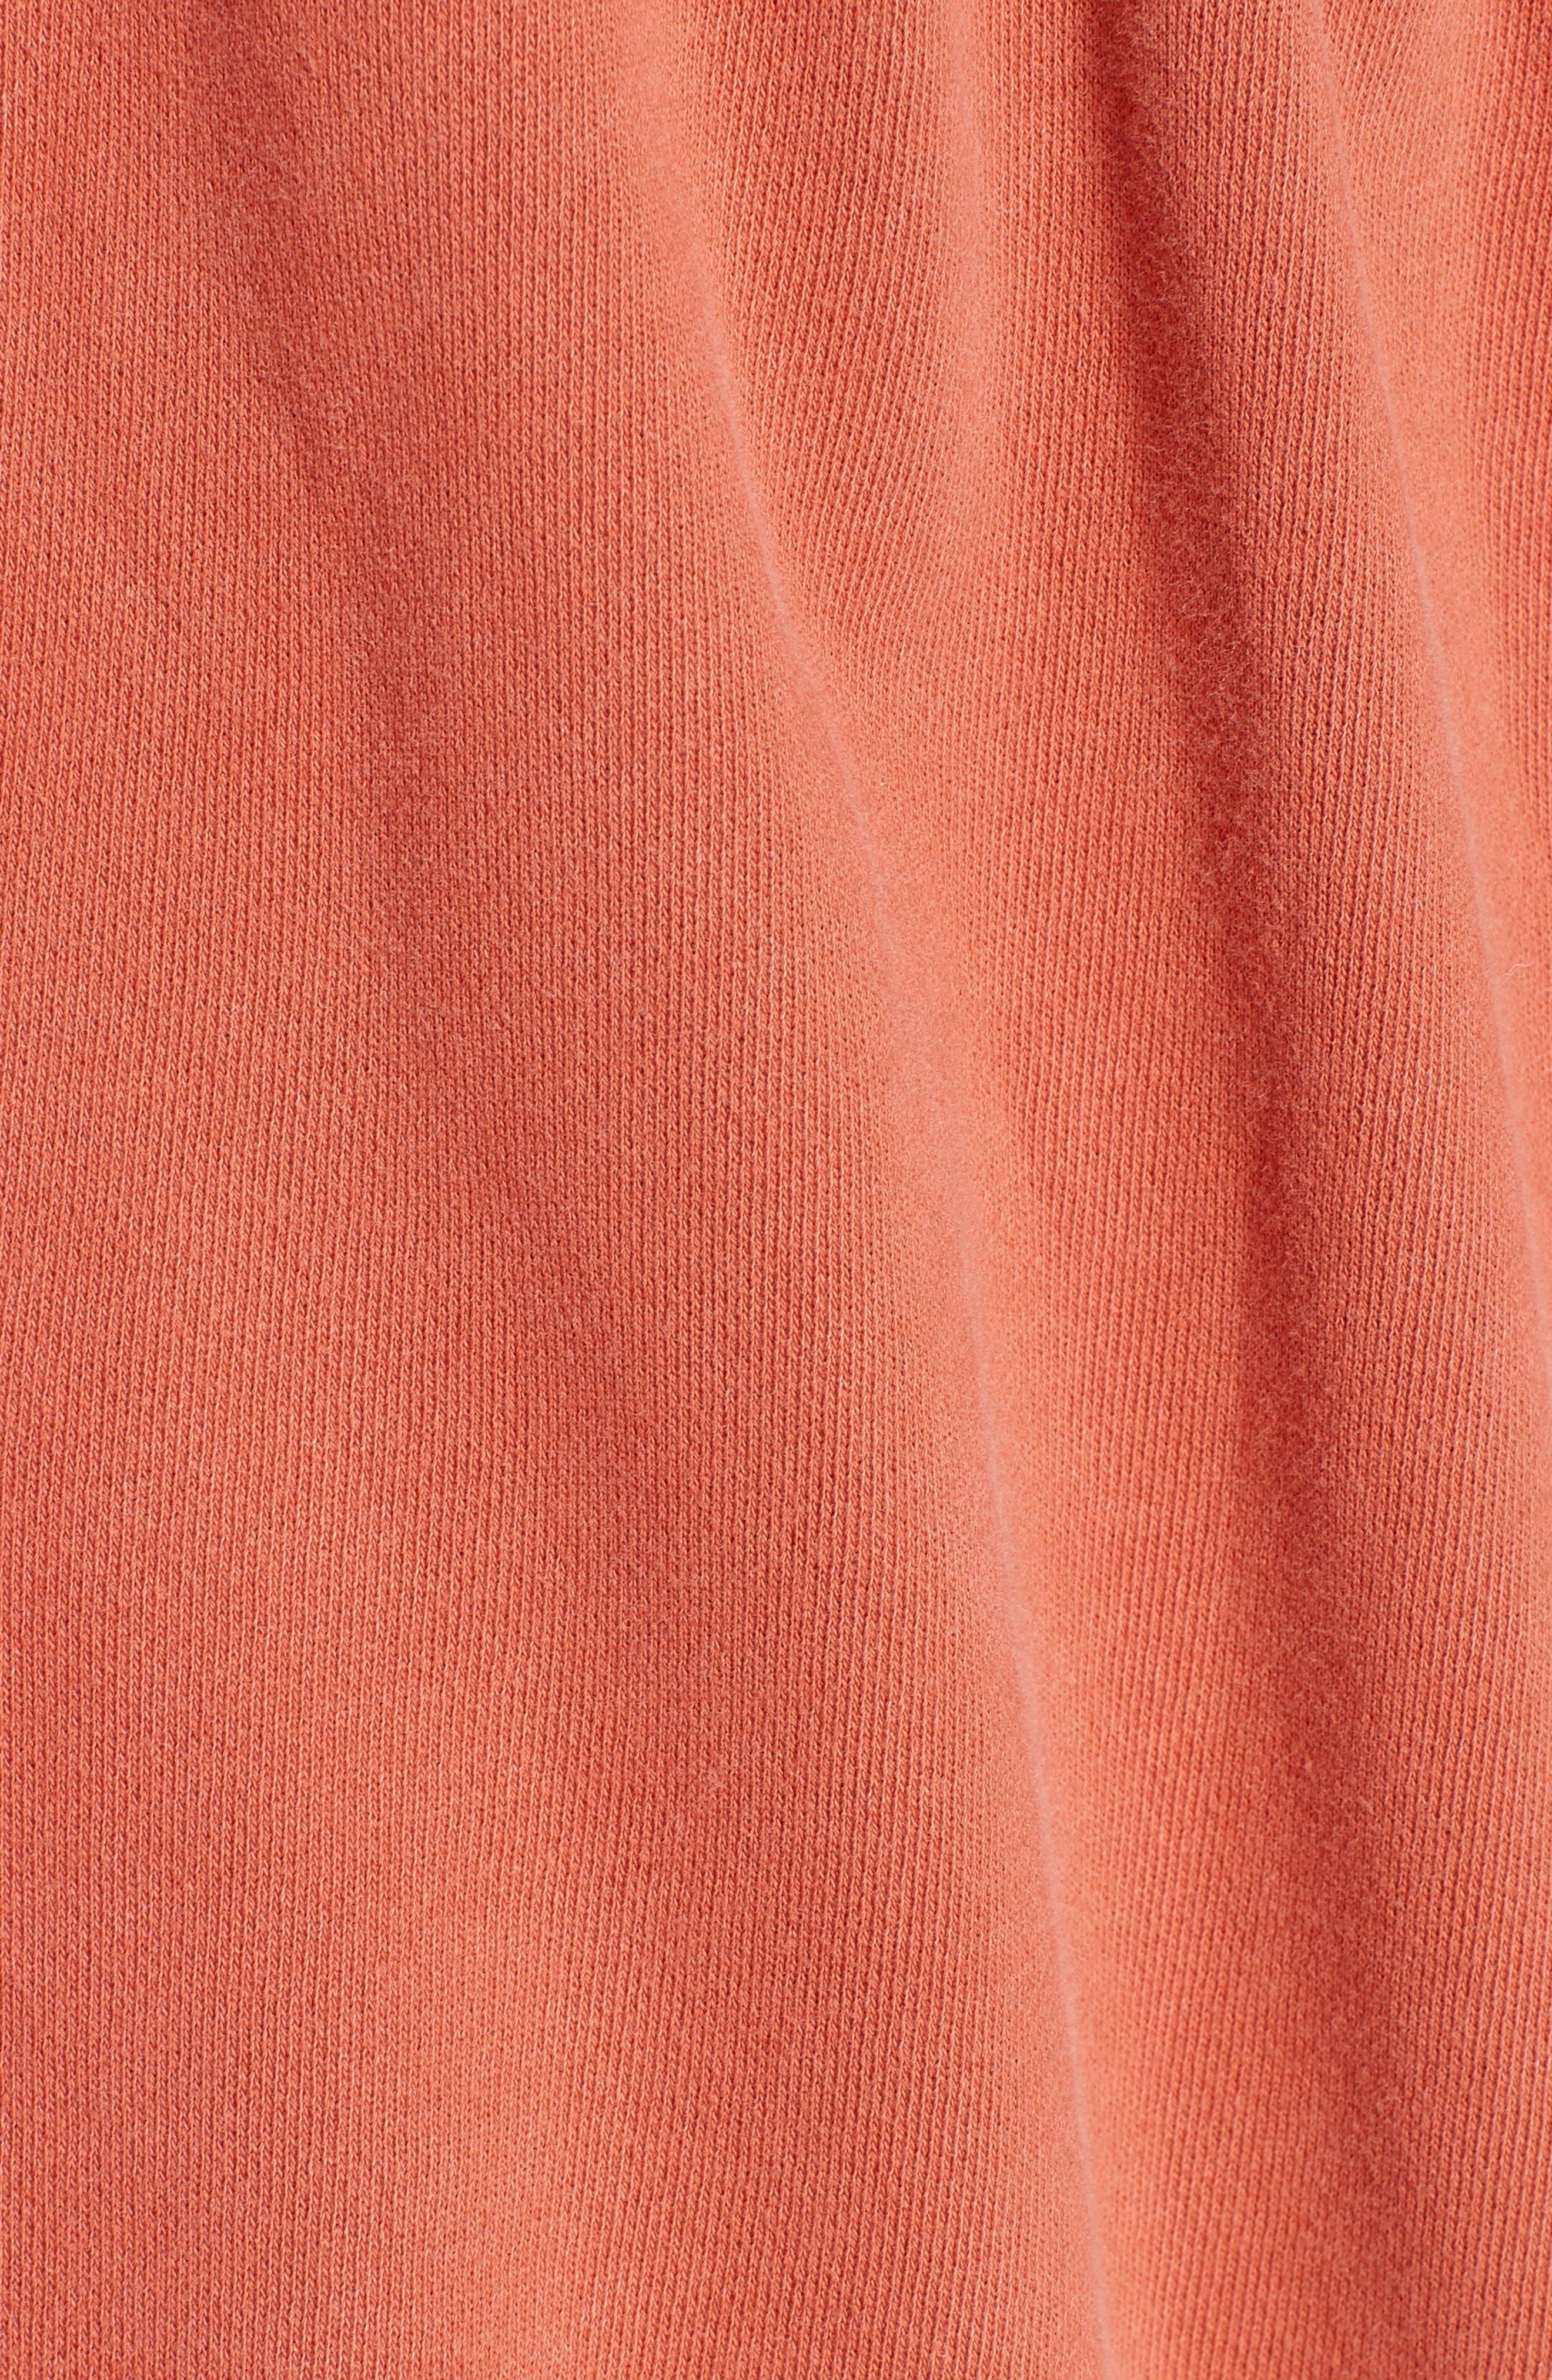 Alternate Image 5  - Free People Brentwood Cotton Cardigan